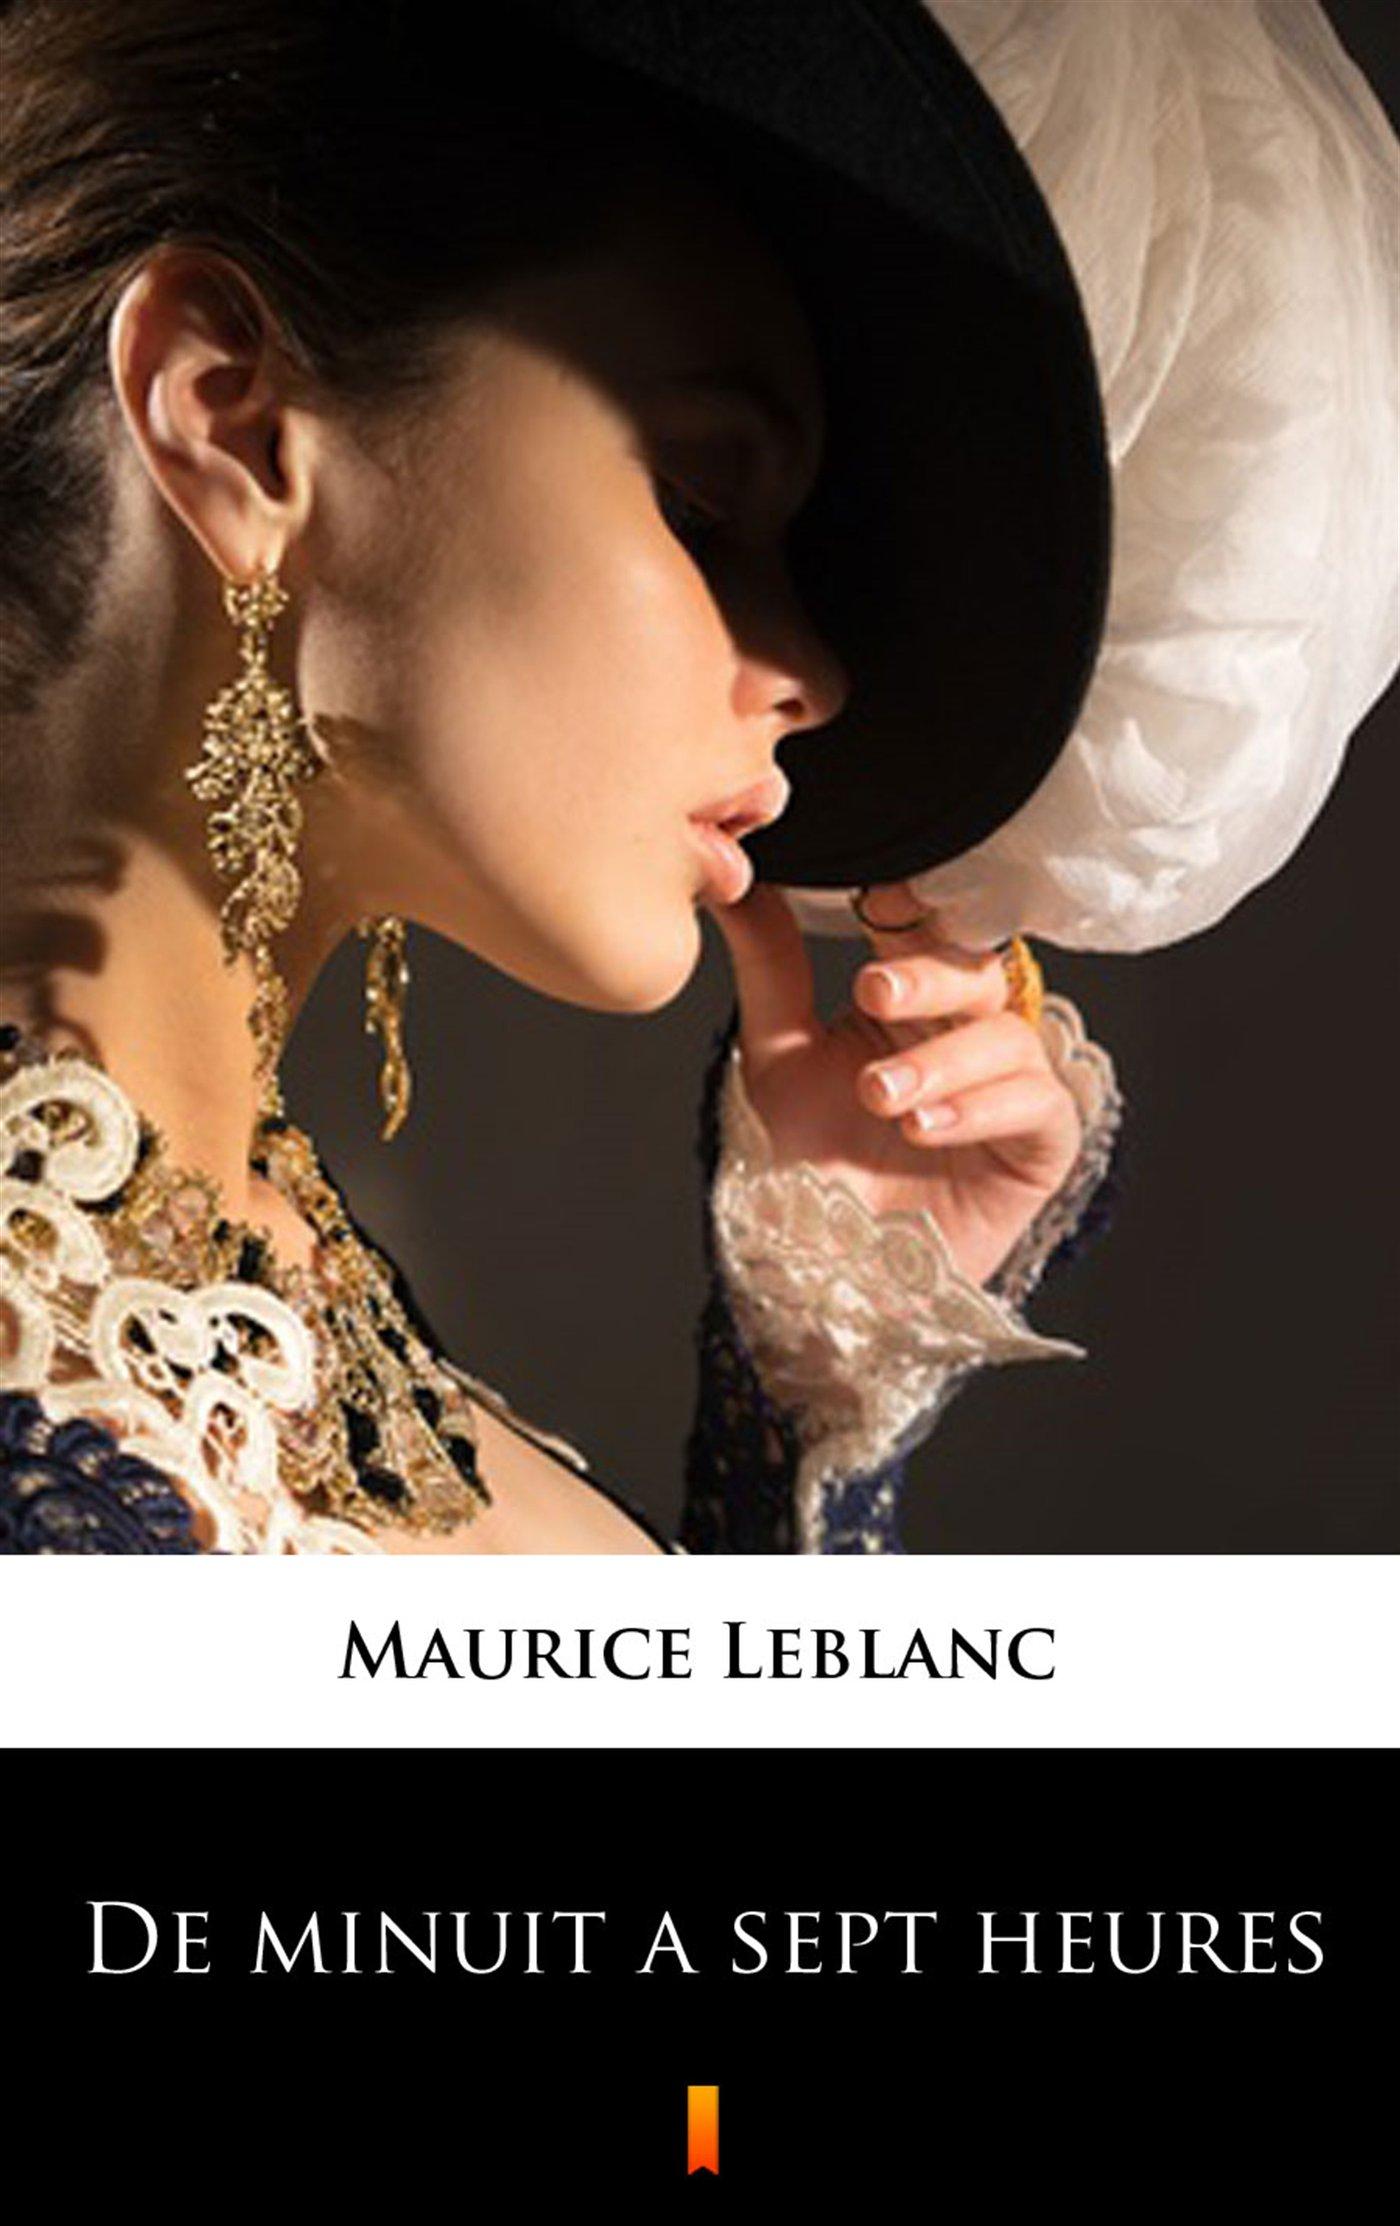 De minuit a sept heures - Ebook (Książka na Kindle) do pobrania w formacie MOBI